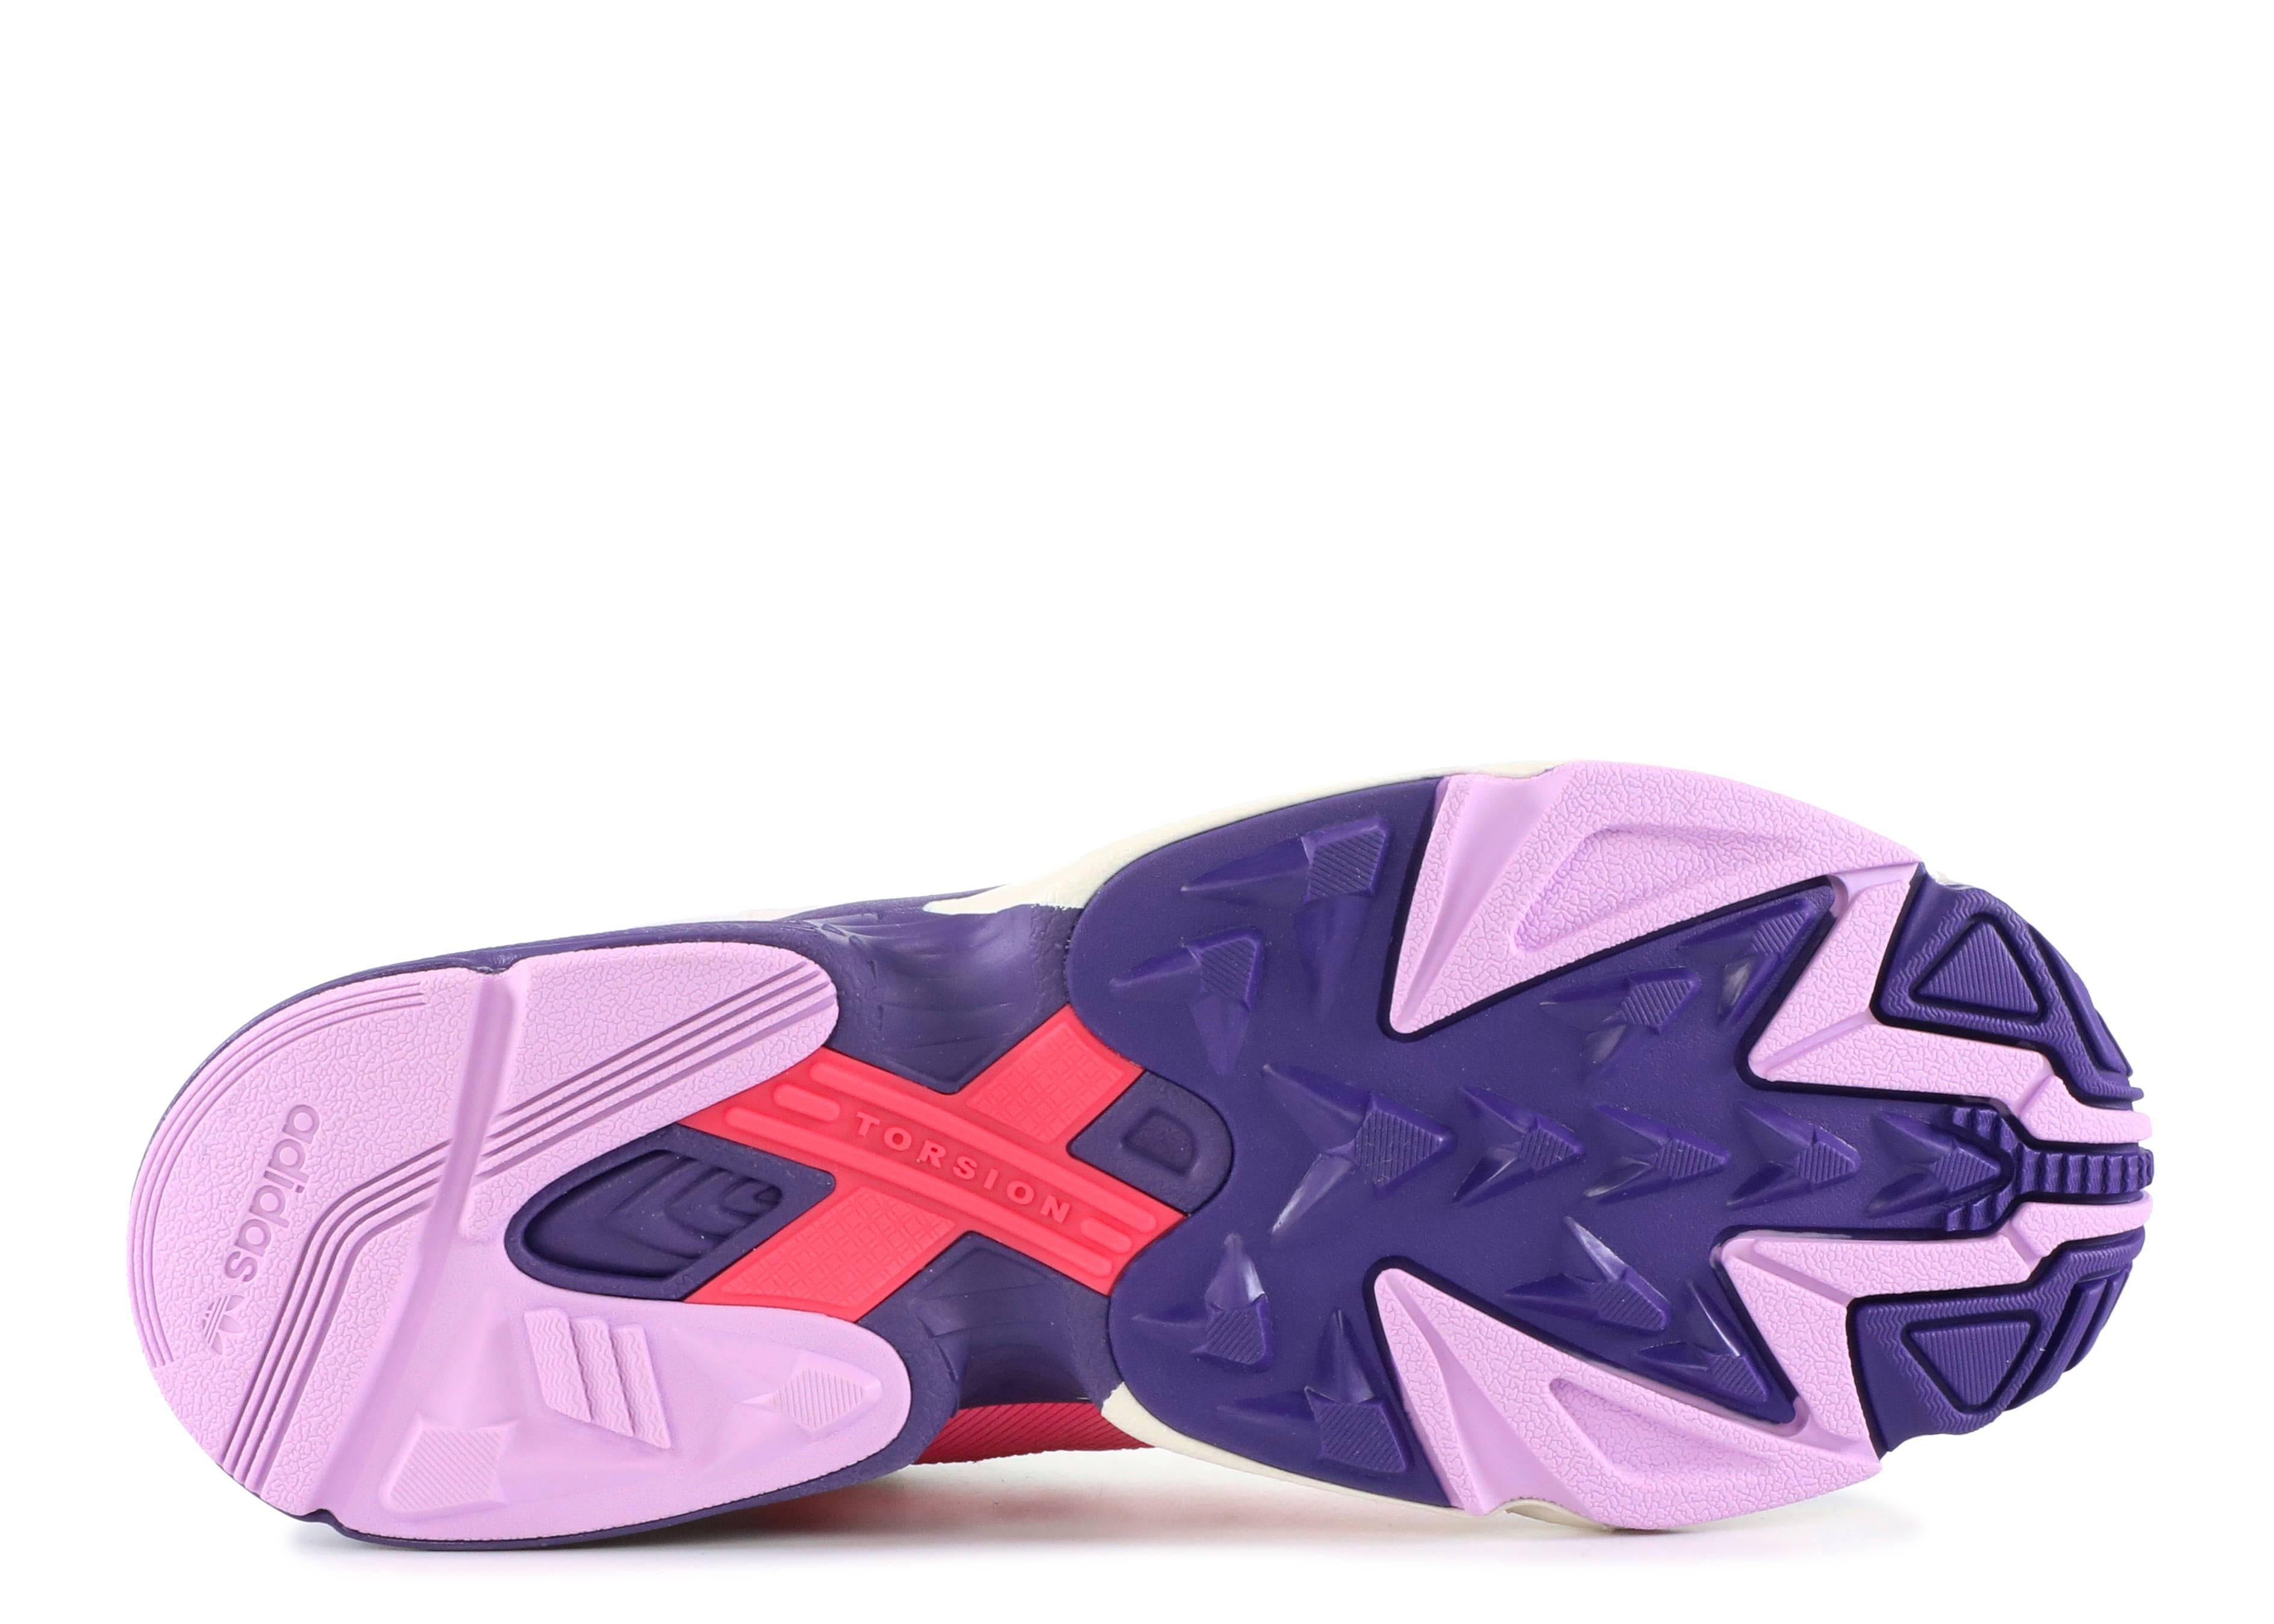 online retailer 80246 1f637 Dragon Ball Z X Adidas Yung-1